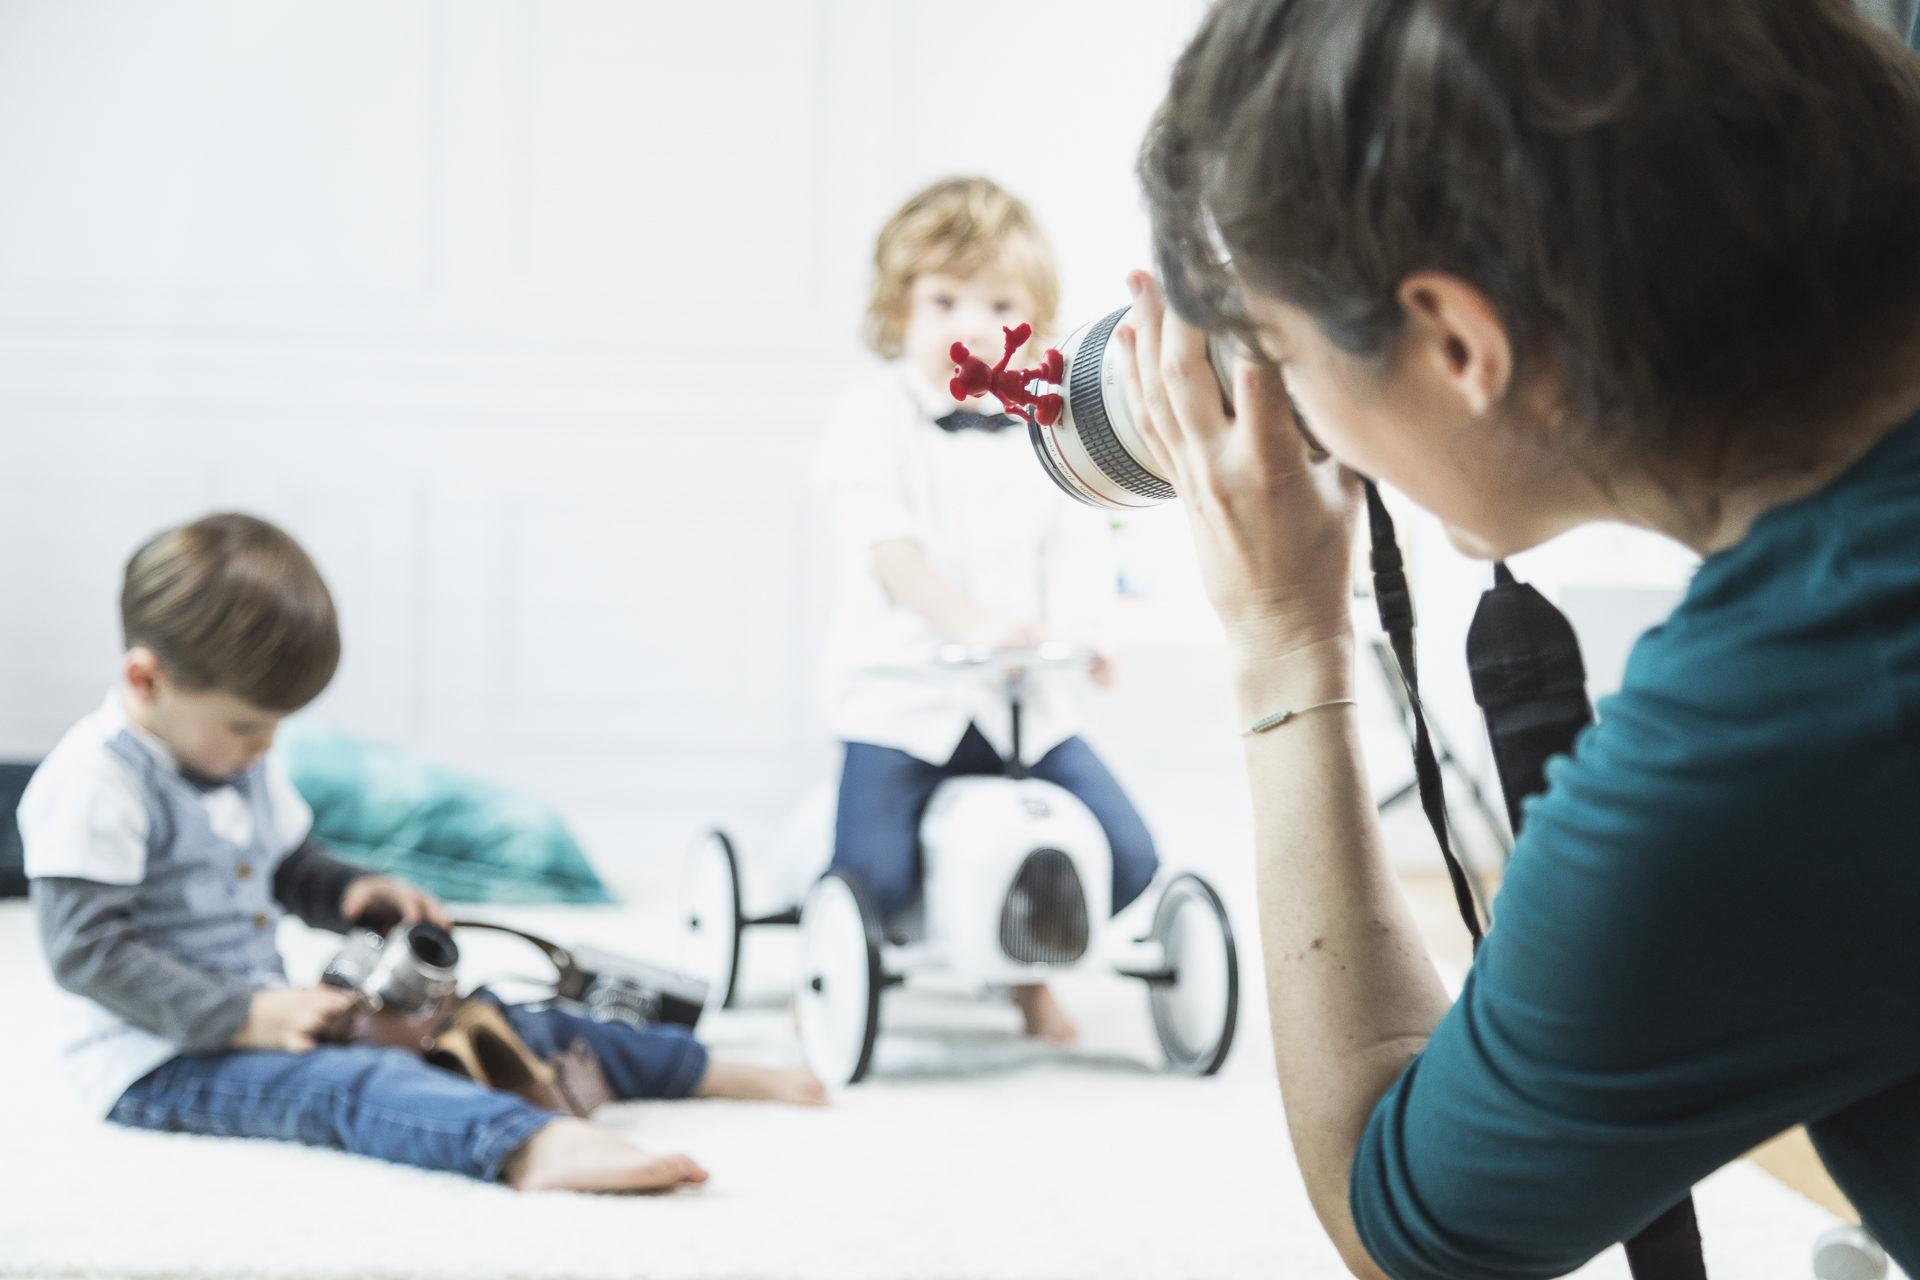 galerie-littlephotographers-24-kindergartenfotografie